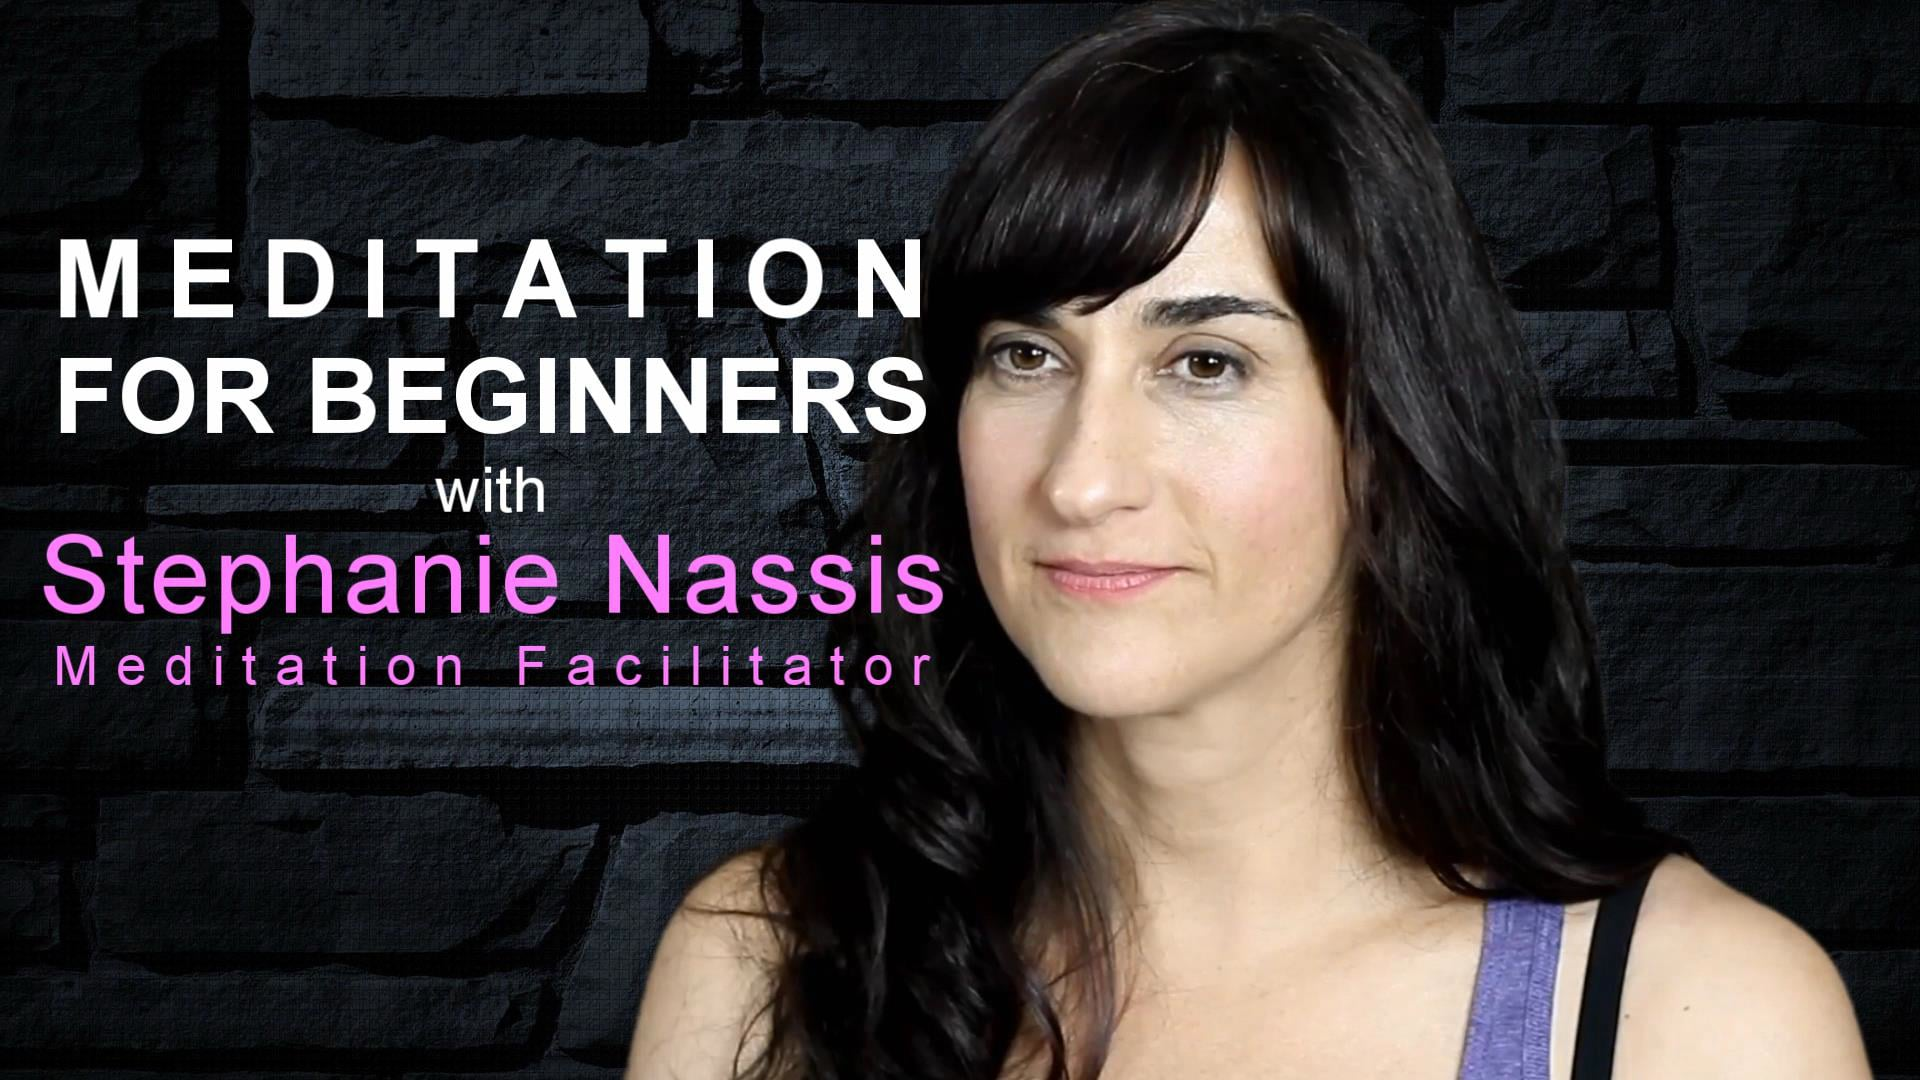 Part 1: Meditation For Beginners